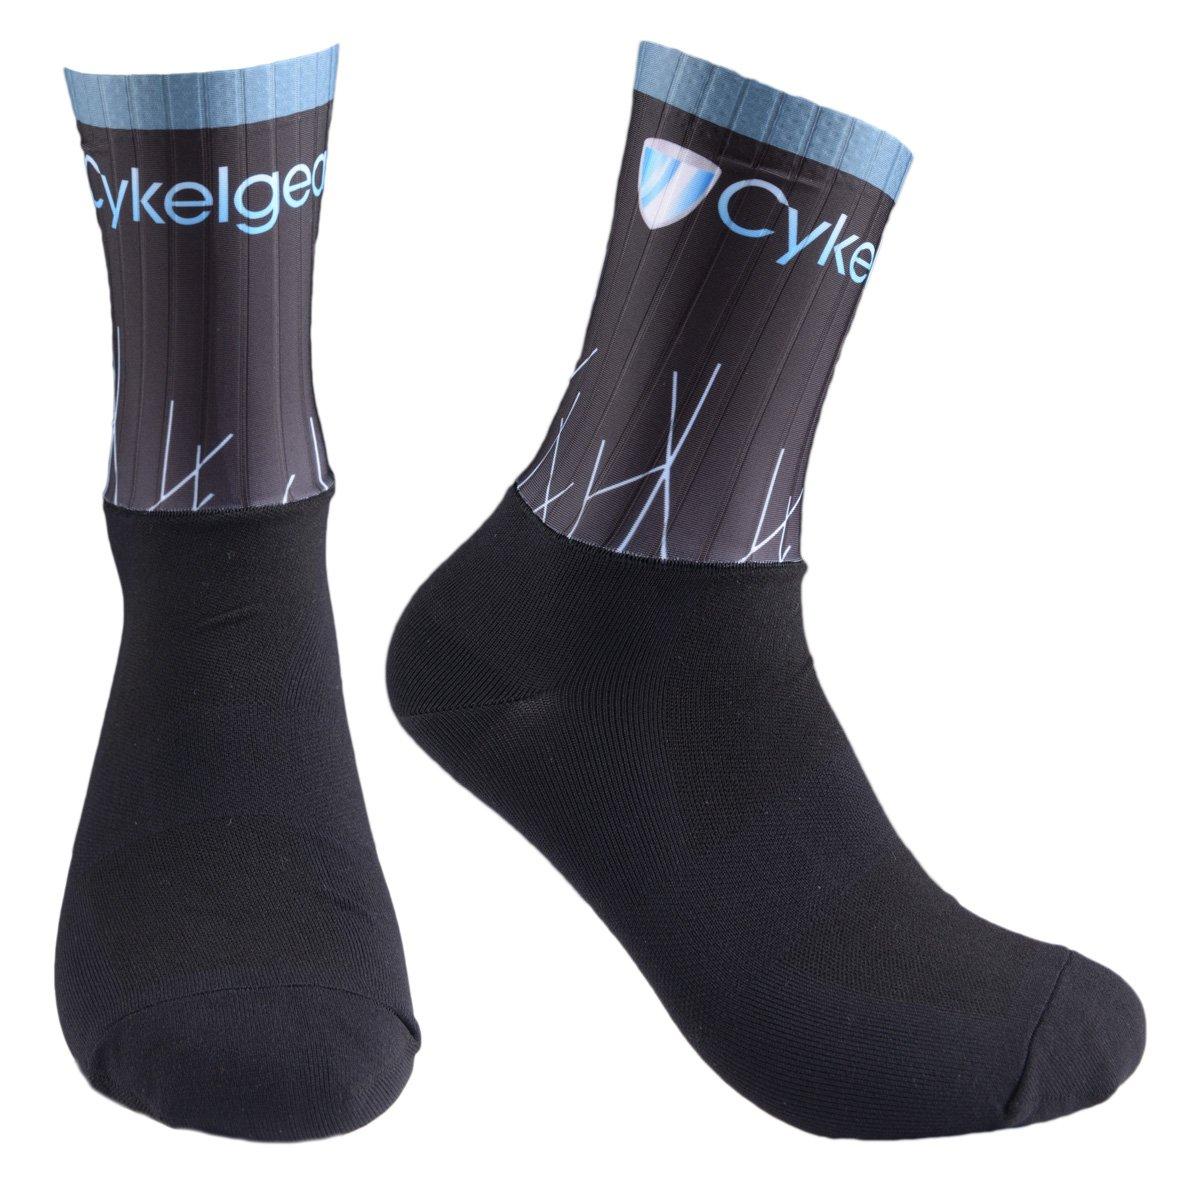 Cykelgear.dk Team strømper | Socks